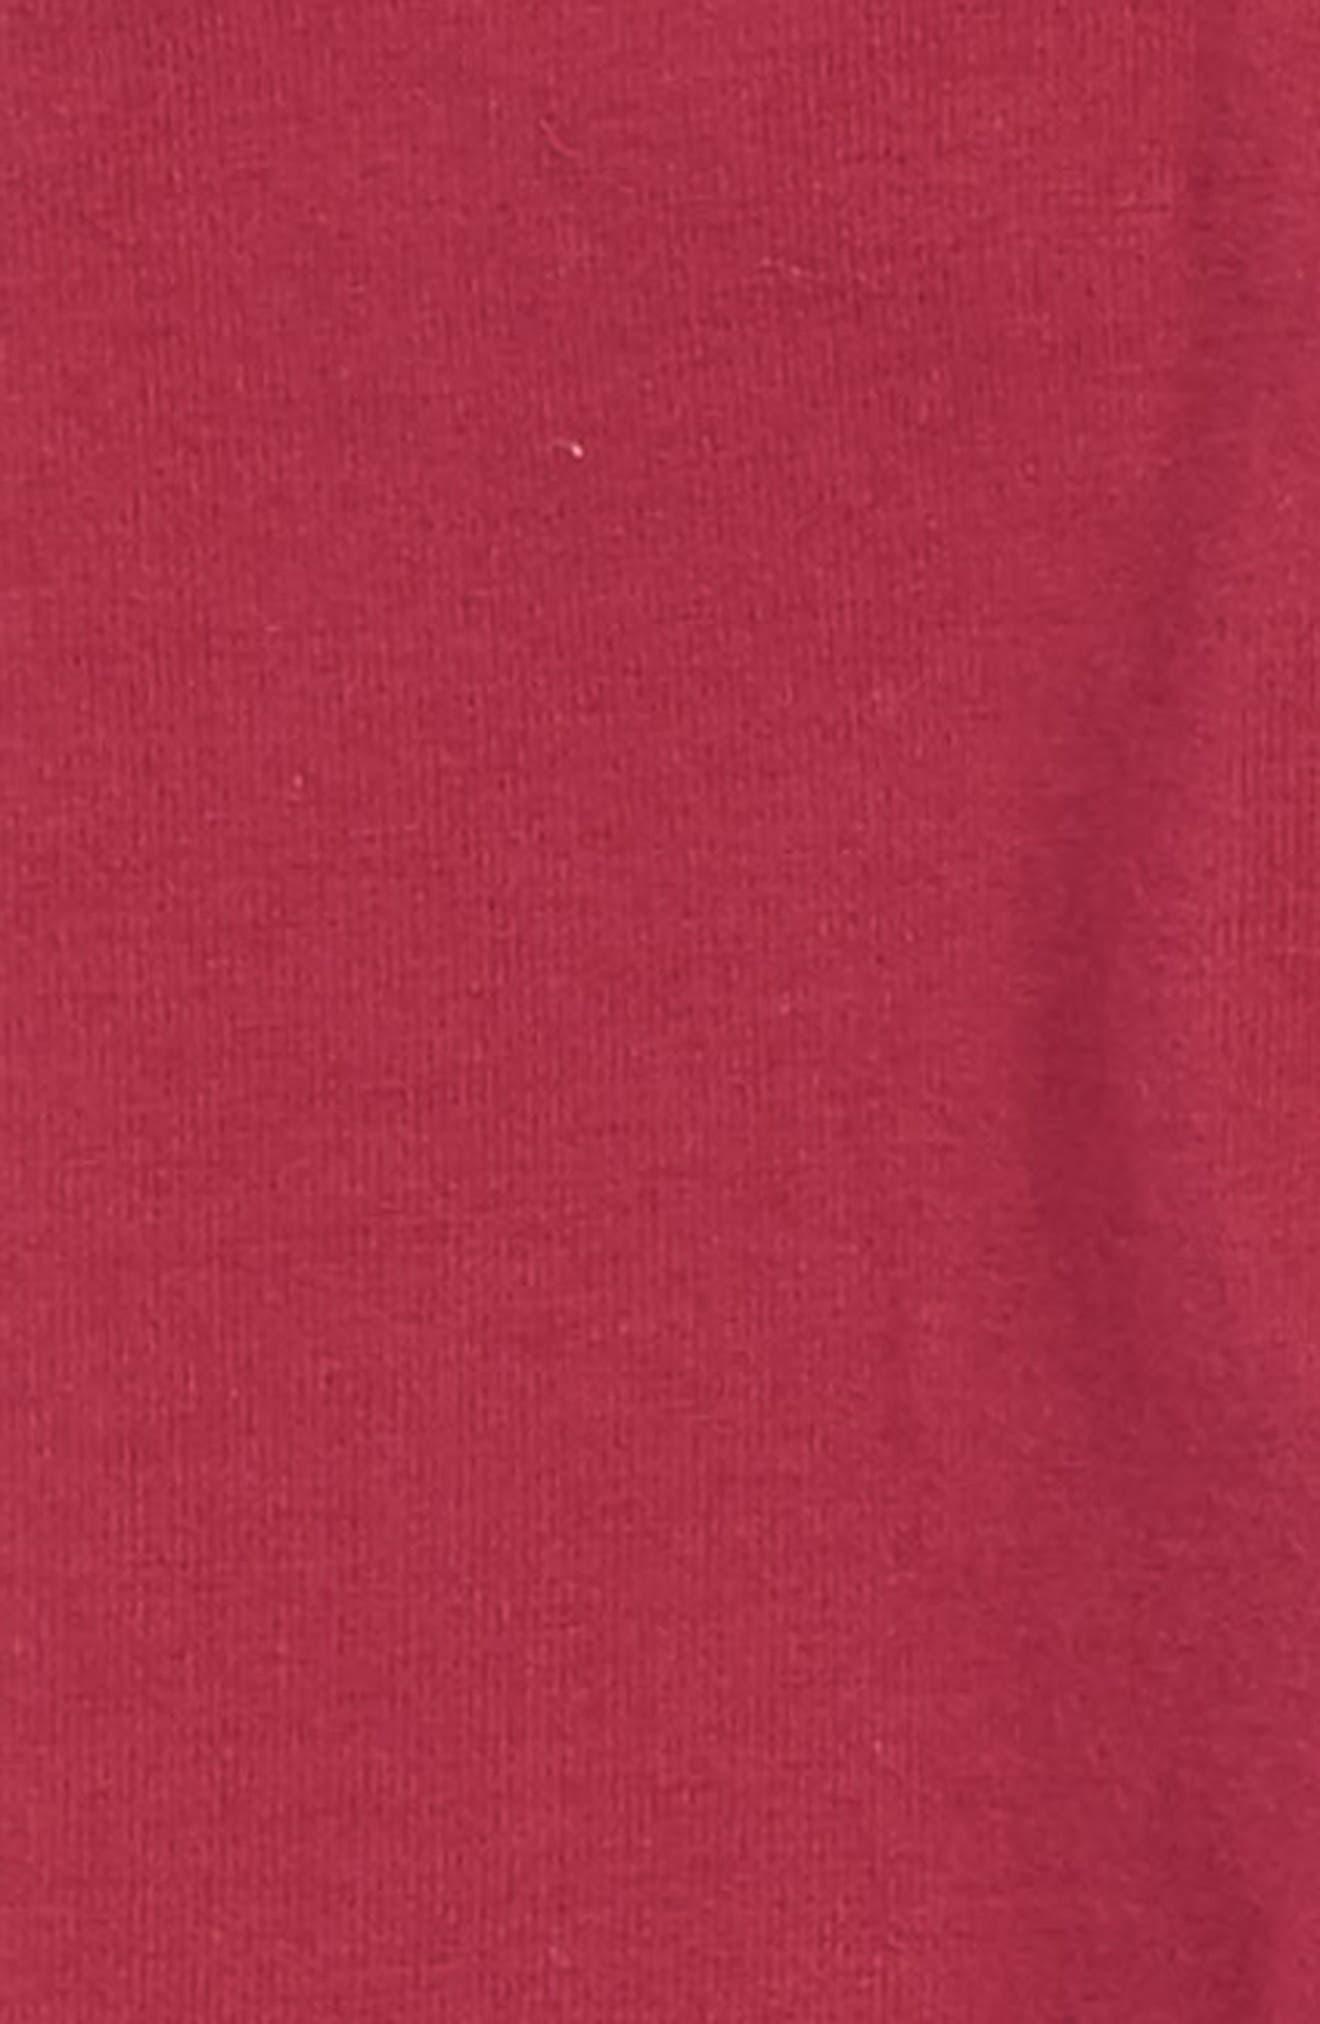 Knit Leggings,                             Alternate thumbnail 2, color,                             930